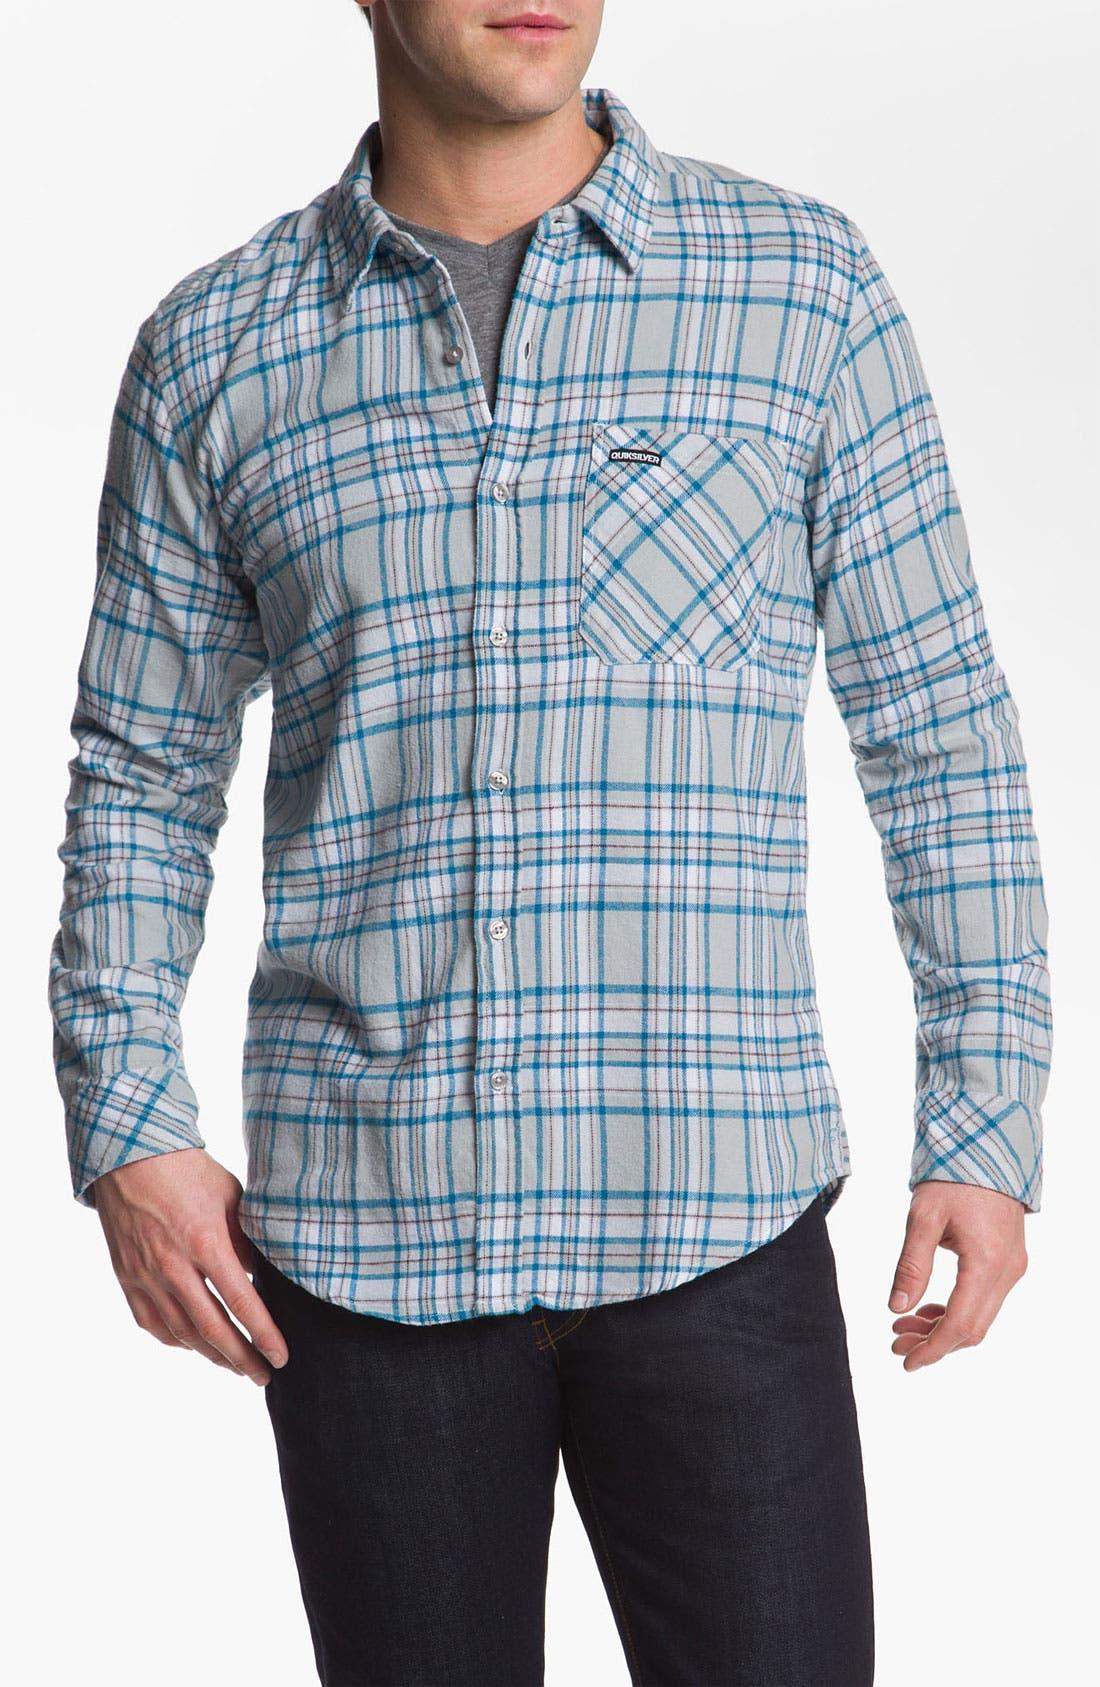 Alternate Image 1 Selected - Quiksilver 'Bunga Bunga' Cotton Flannel Shirt